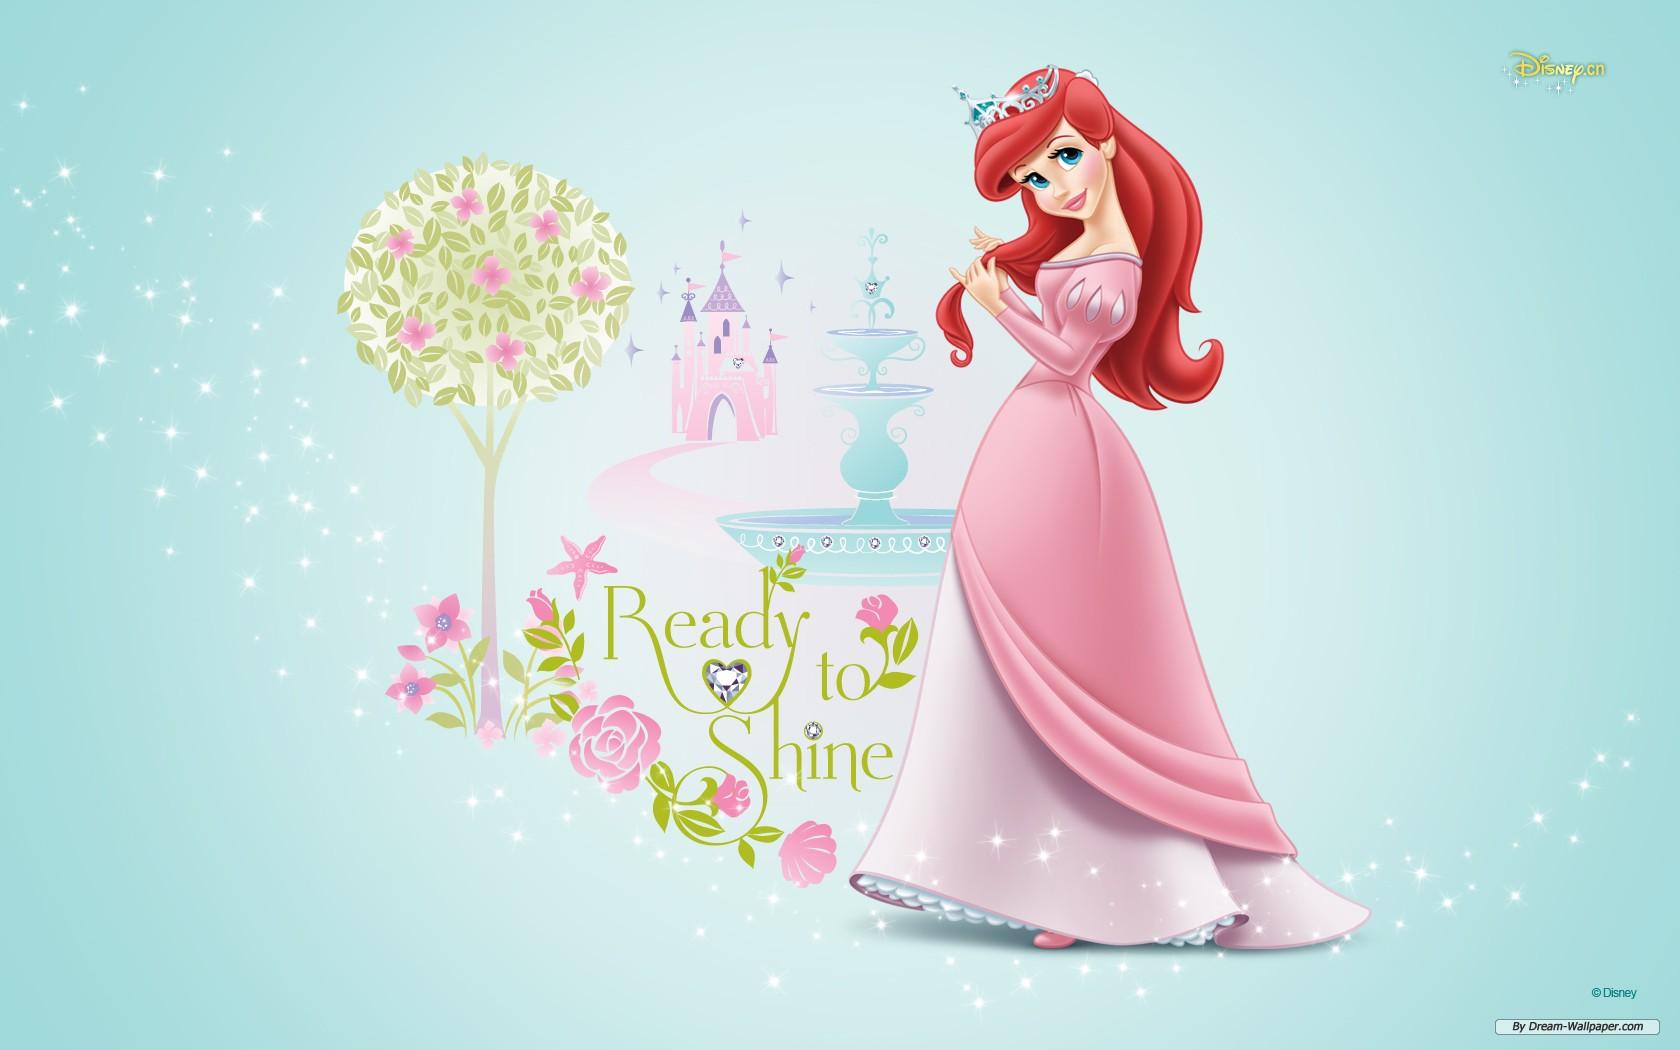 Disney Princess Ariel Pink 1680x1050